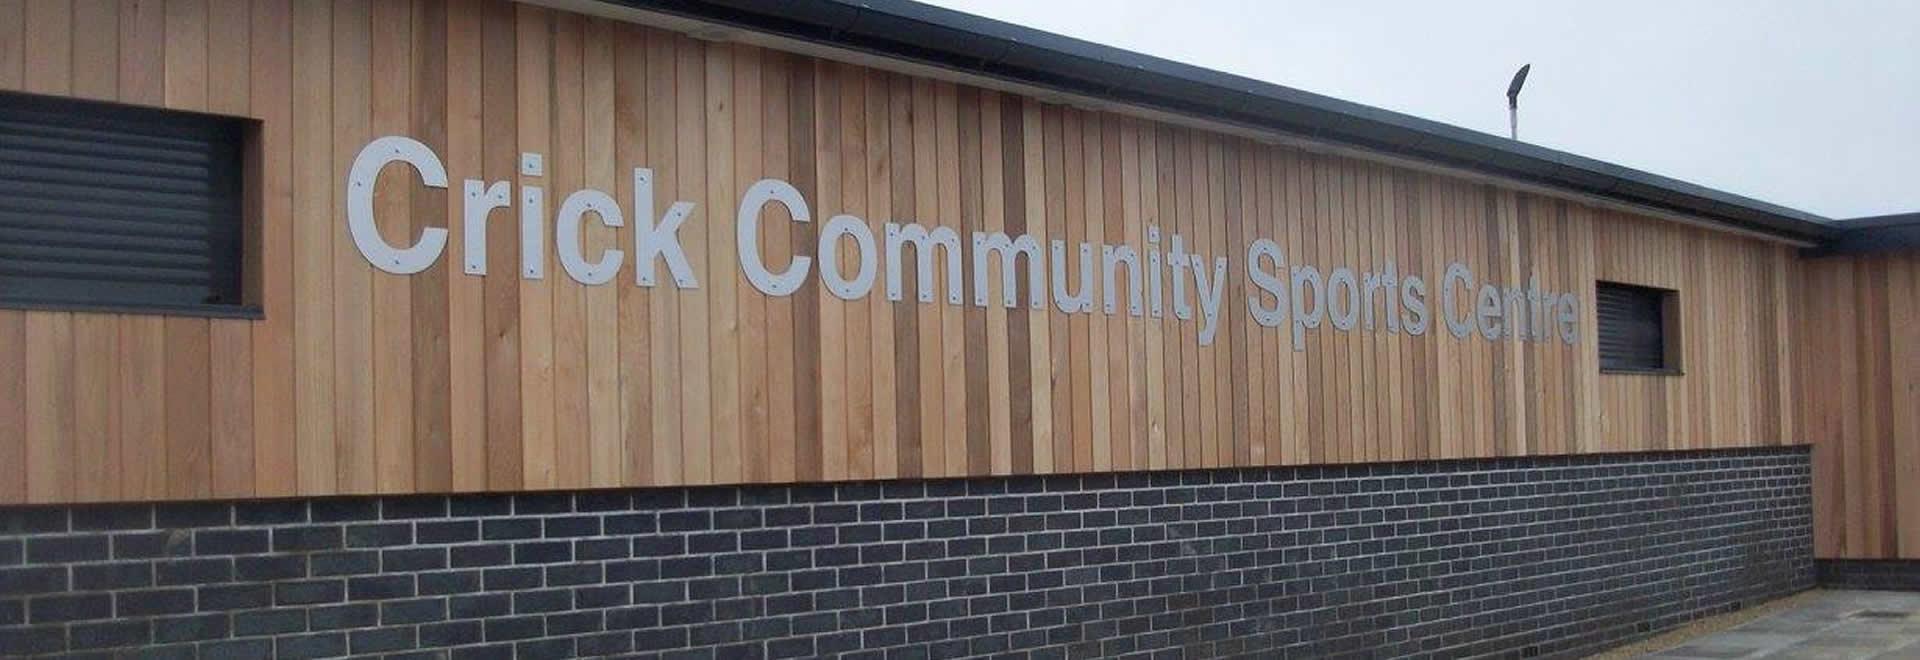 Crick Community Sports Centre